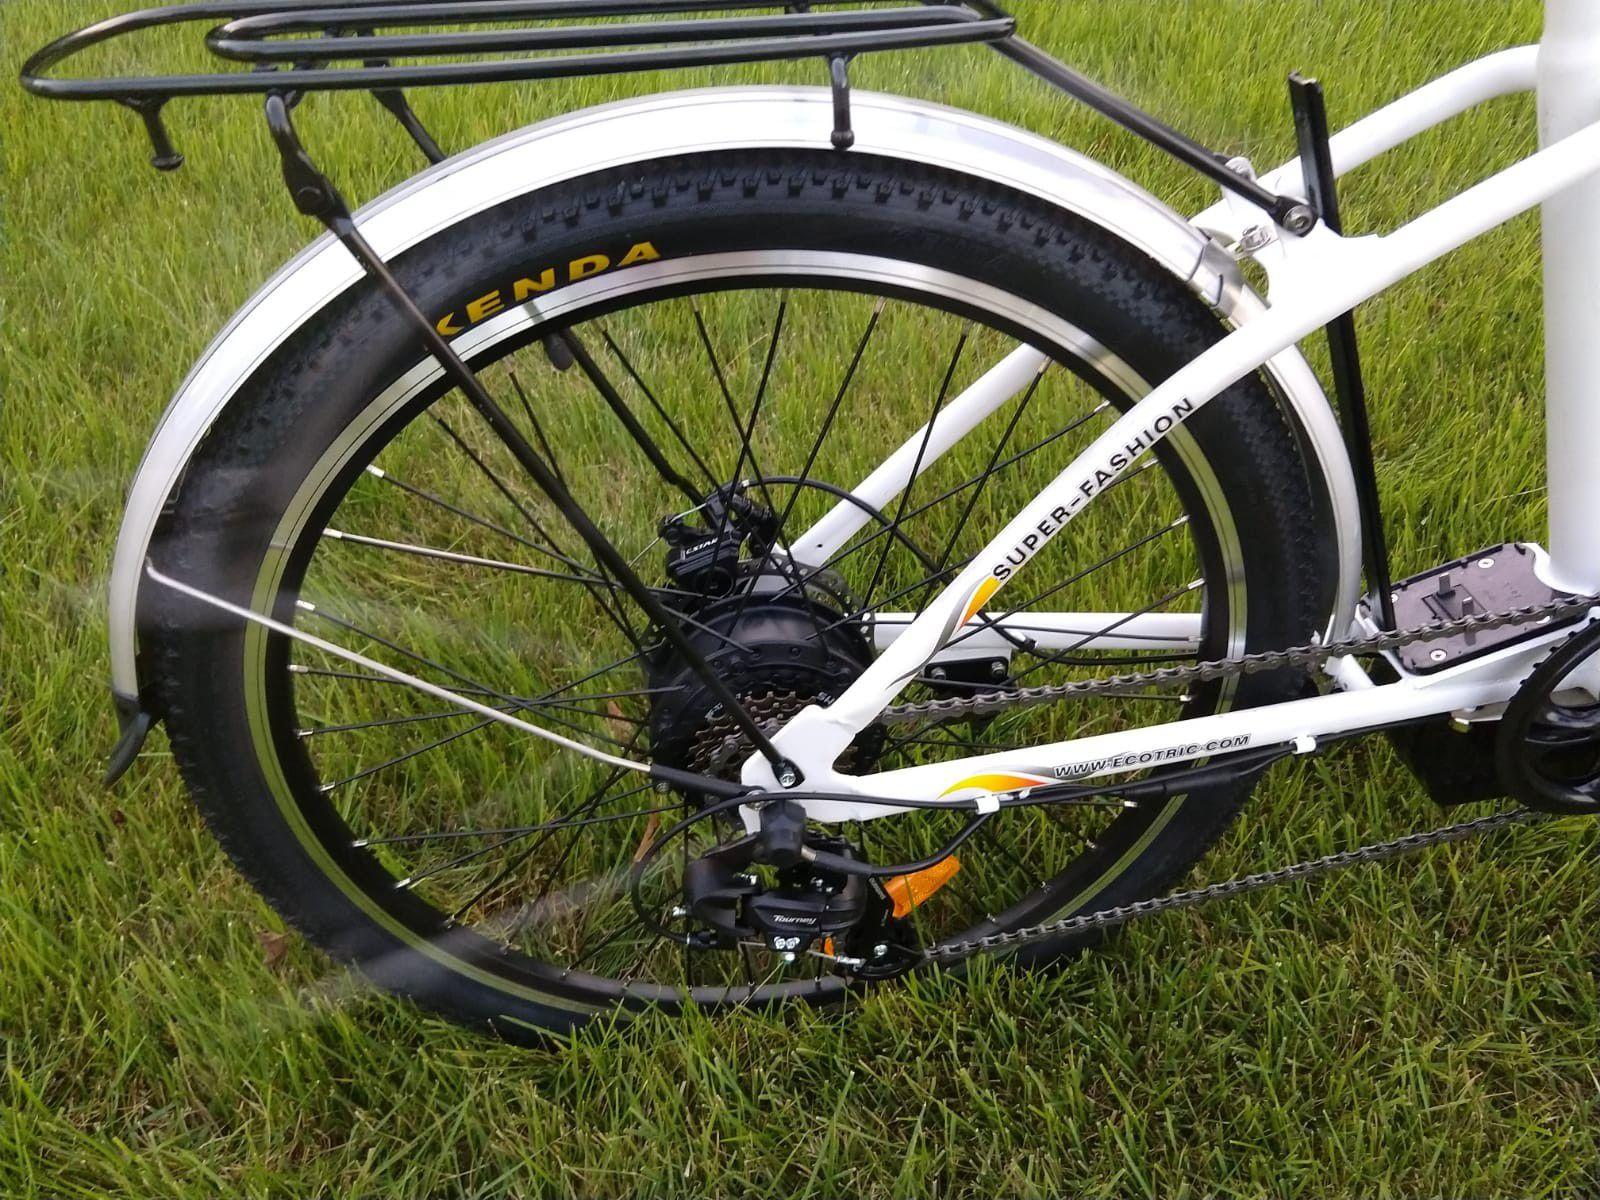 26 inch Brand New Women's ecotric electric bike